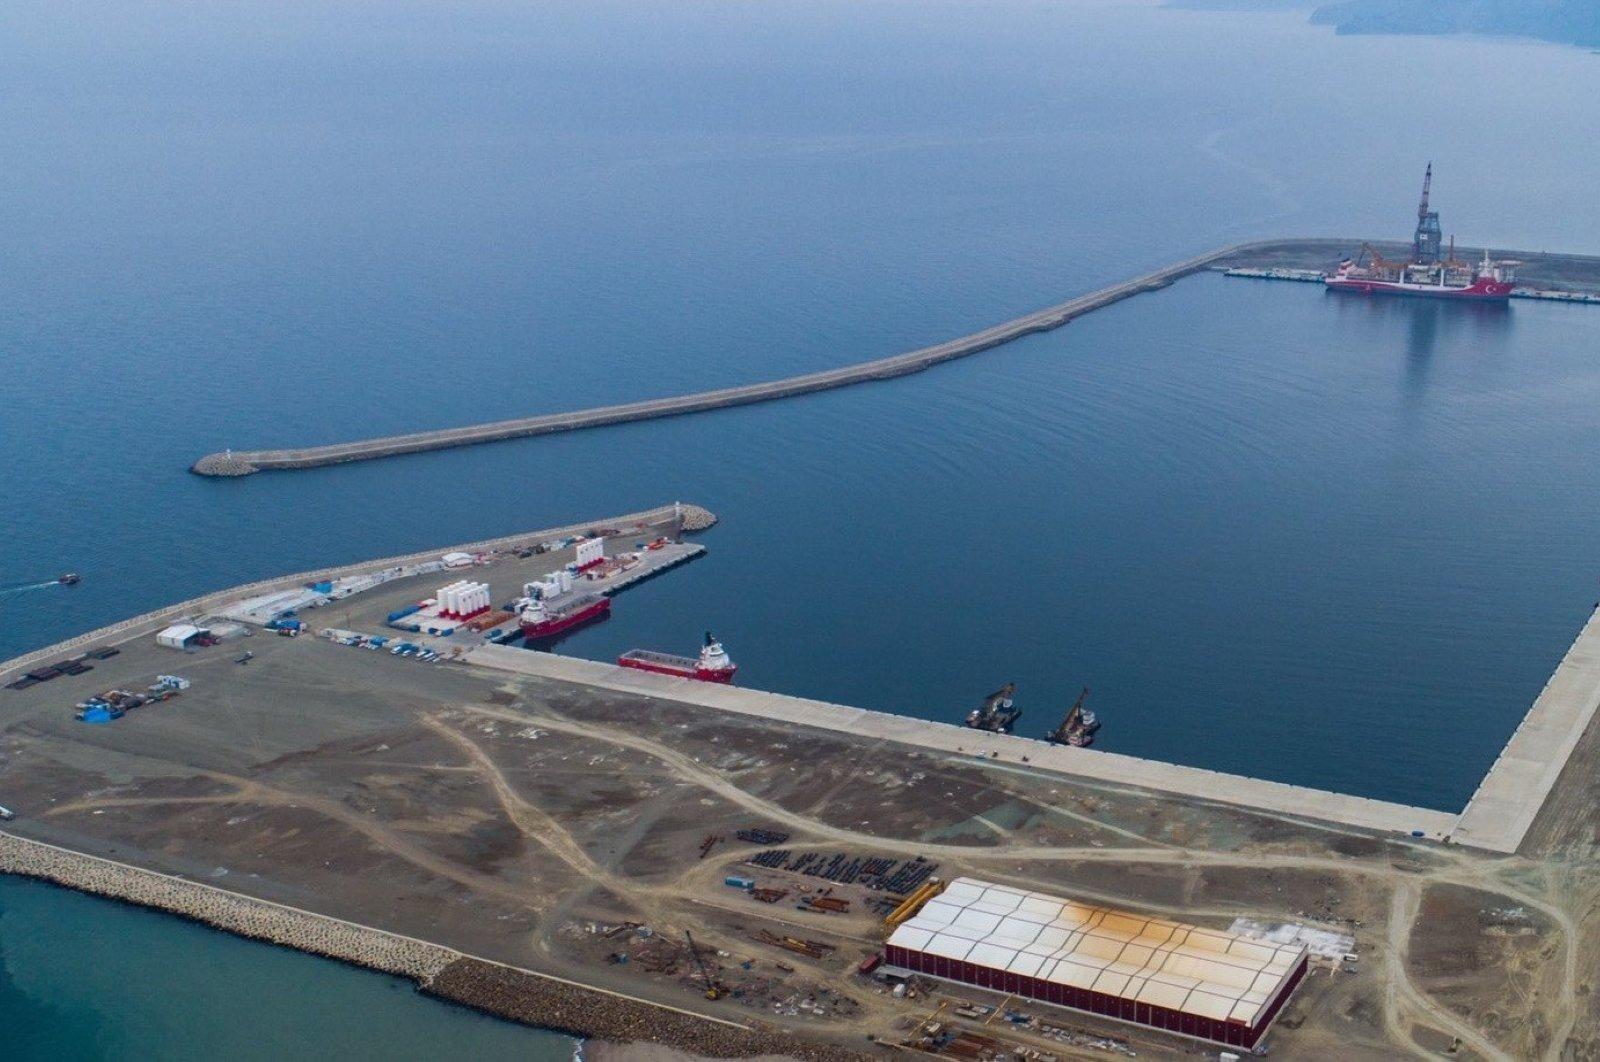 Turkey's drillship Kanuni docks at the Port of Filyos in northern Zonguldak province, Turkey, Feb. 17, 2021. (IHA Photo)